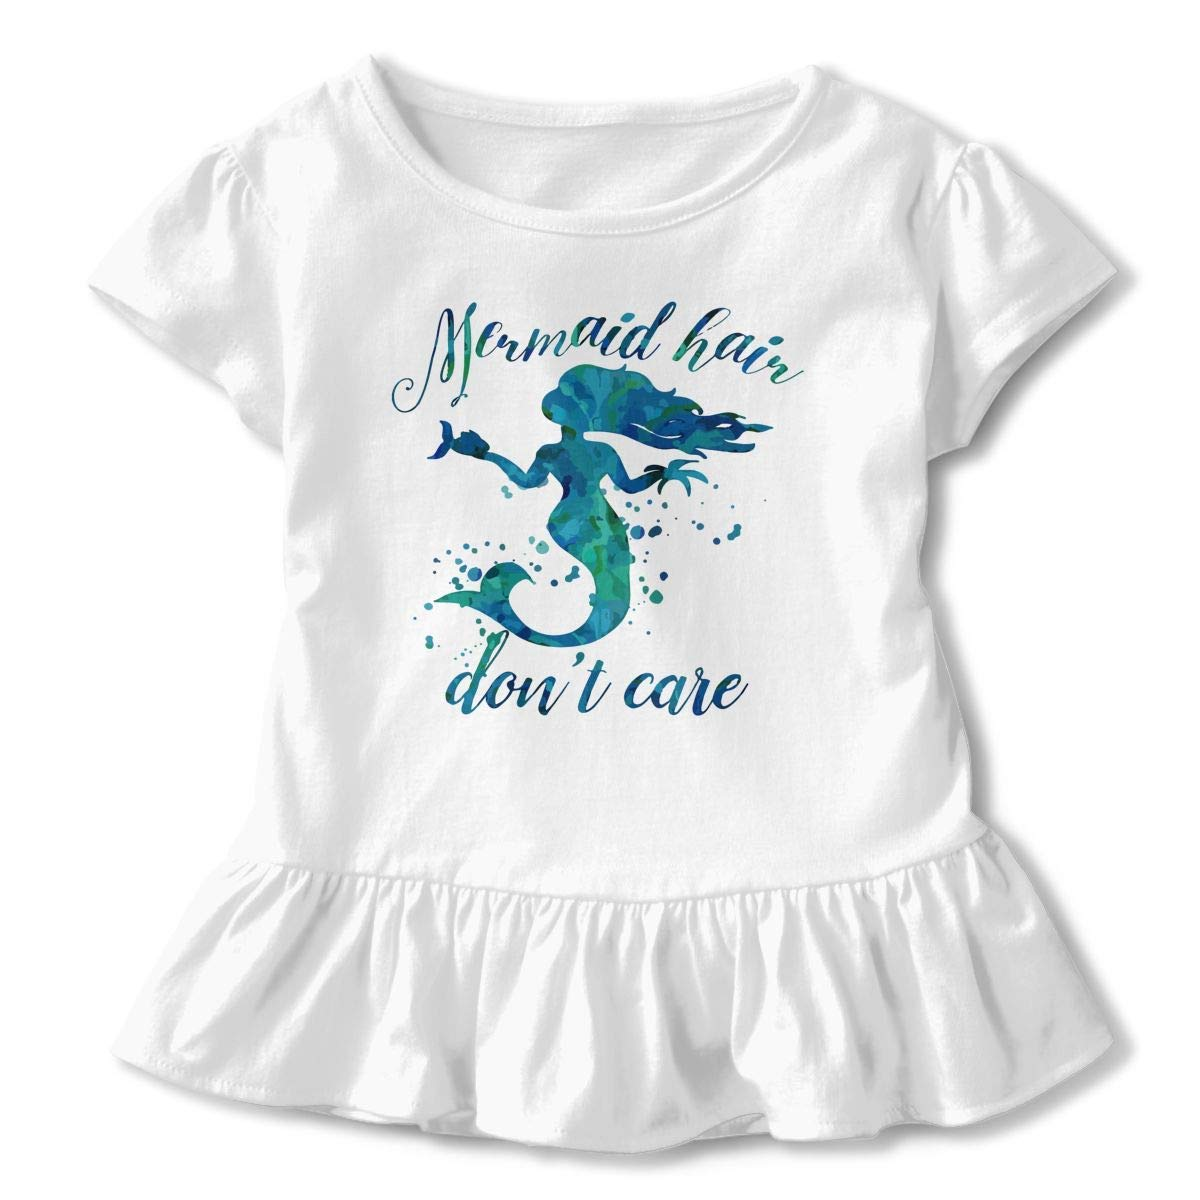 lu fangfangc Mermaid Hair Dont Care Girls Short-Sleeve Tunic Peplum Blouse Shirt